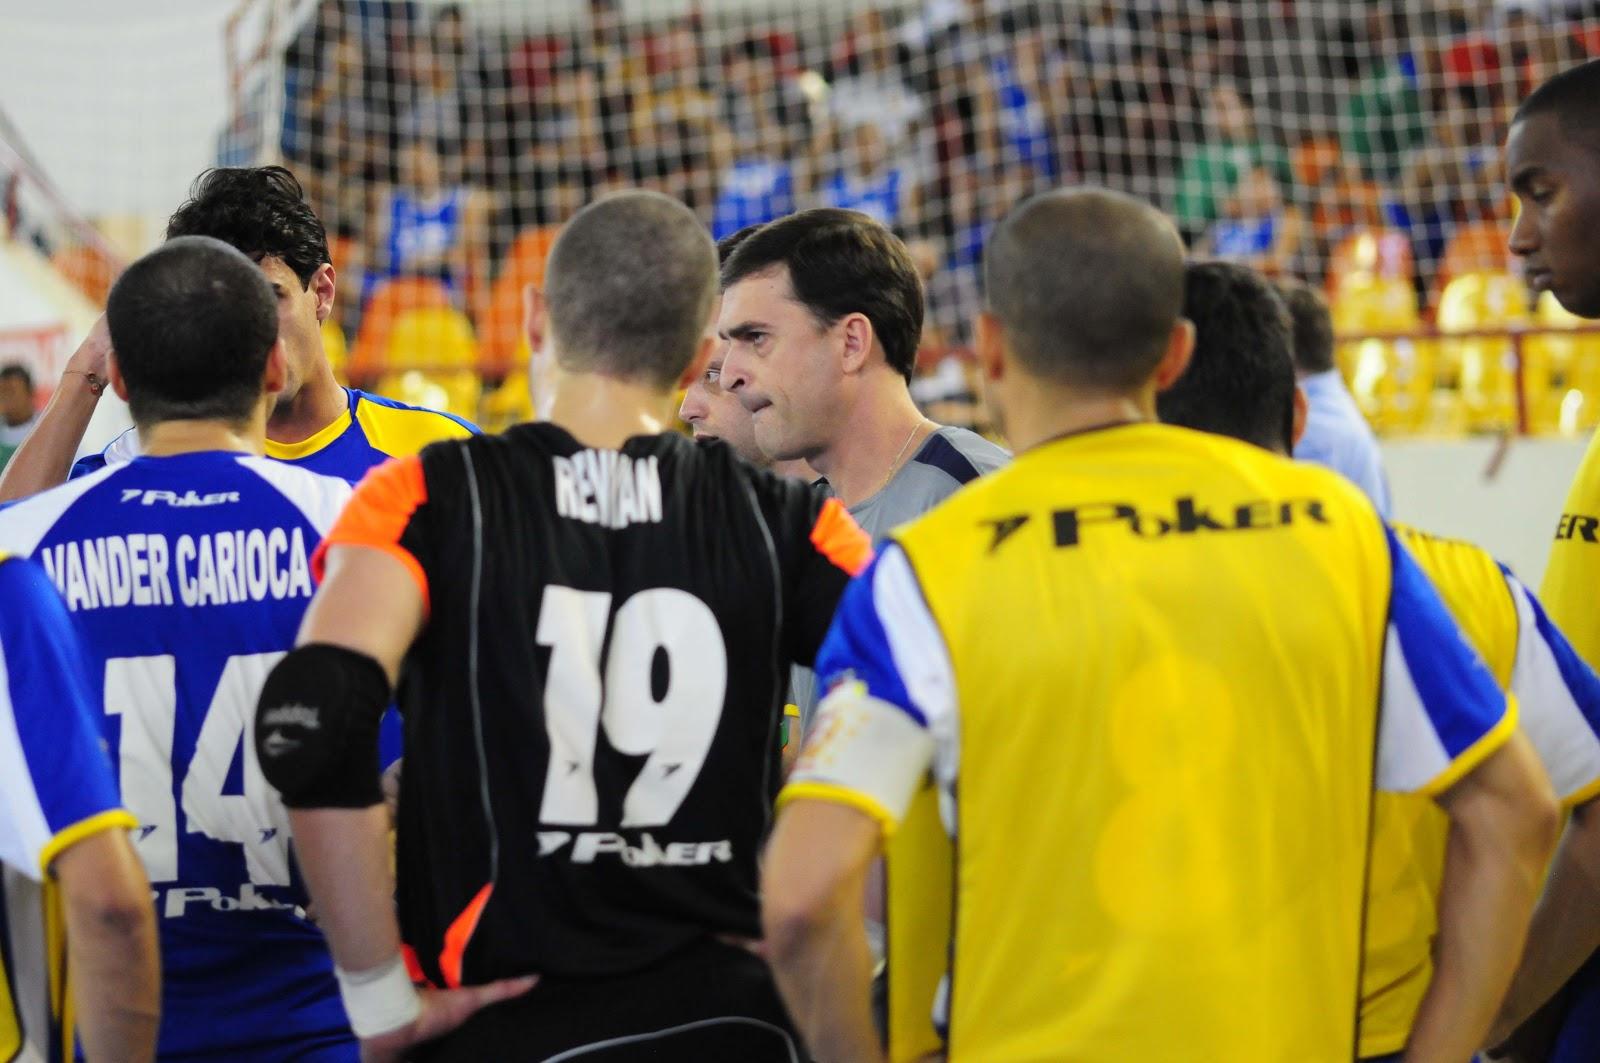 05329d6745 JOSÉ AUGUSTO LEAL - Futsal  Novembro 2010